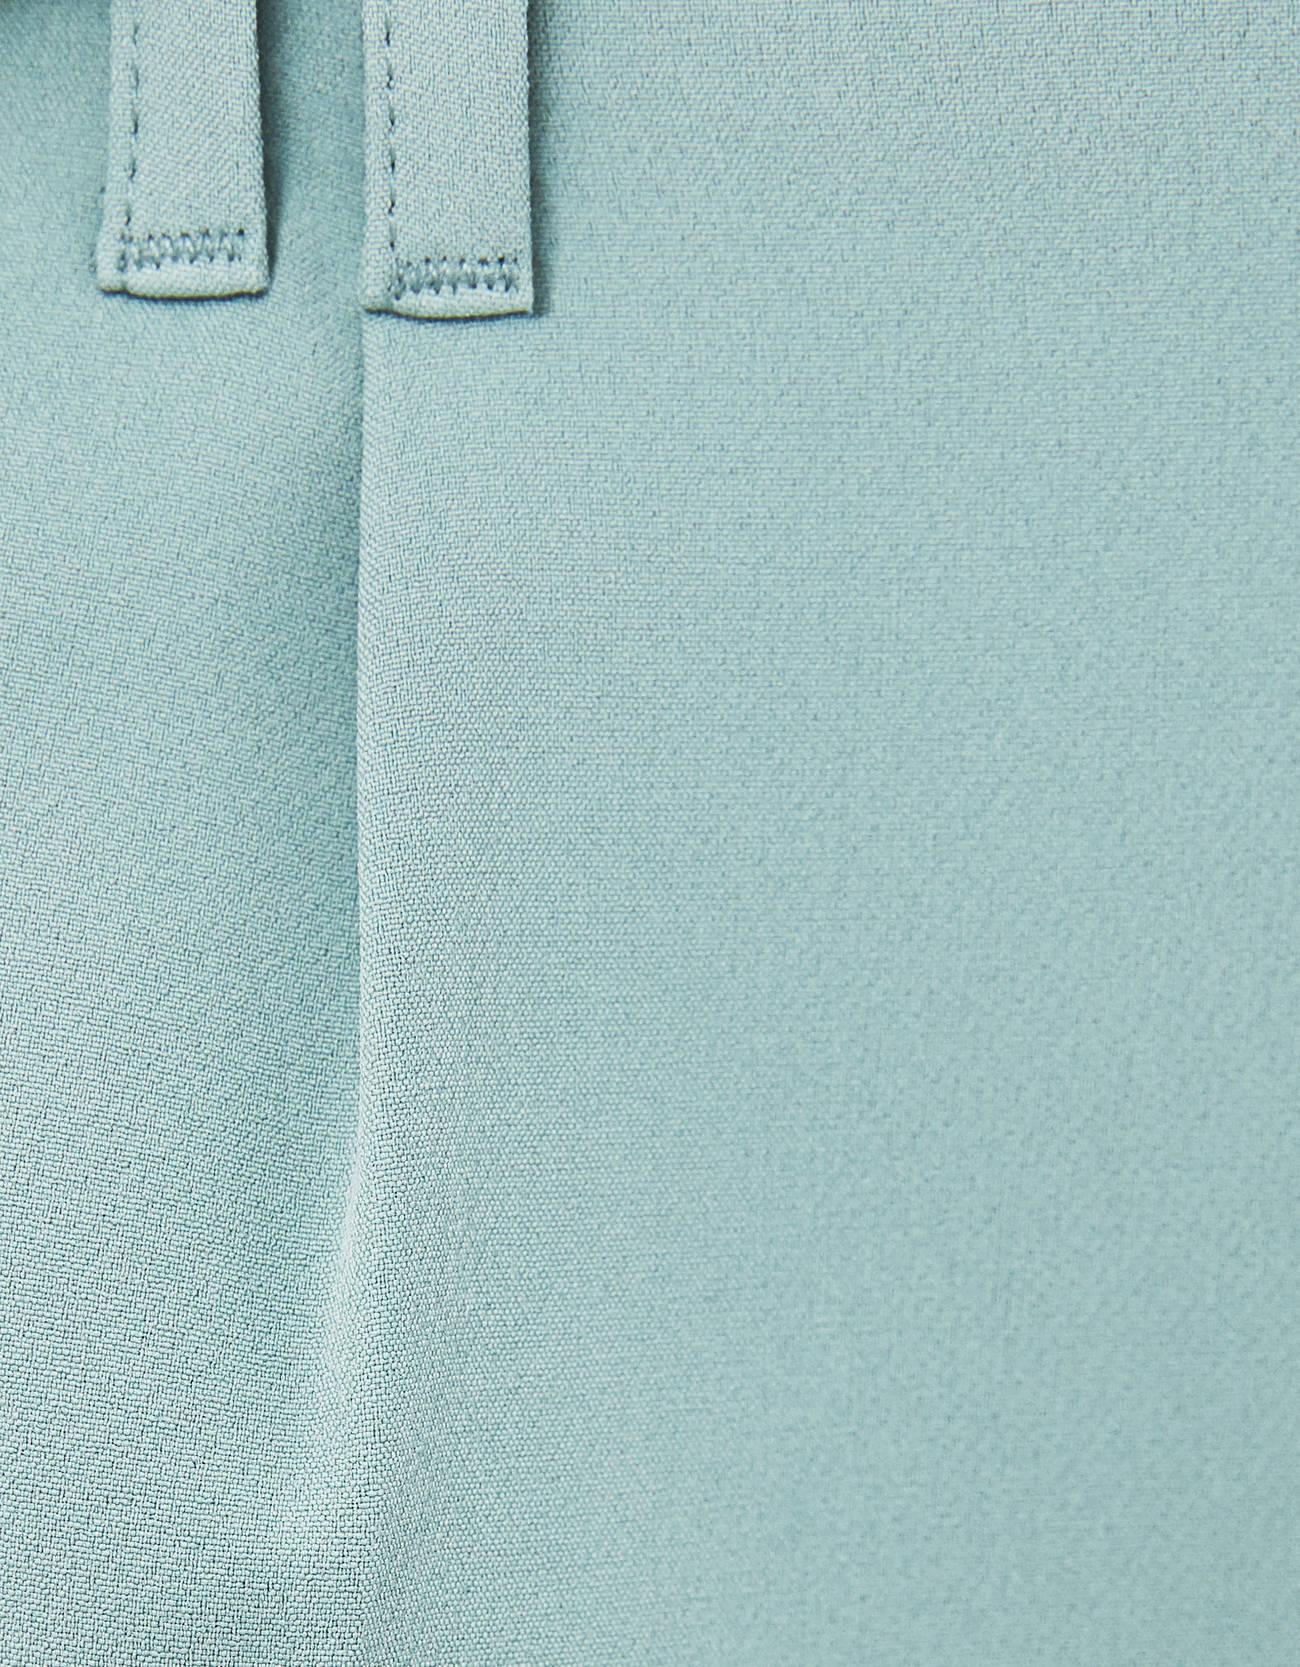 Брюки tailoring с защипами Зеленый Bershka